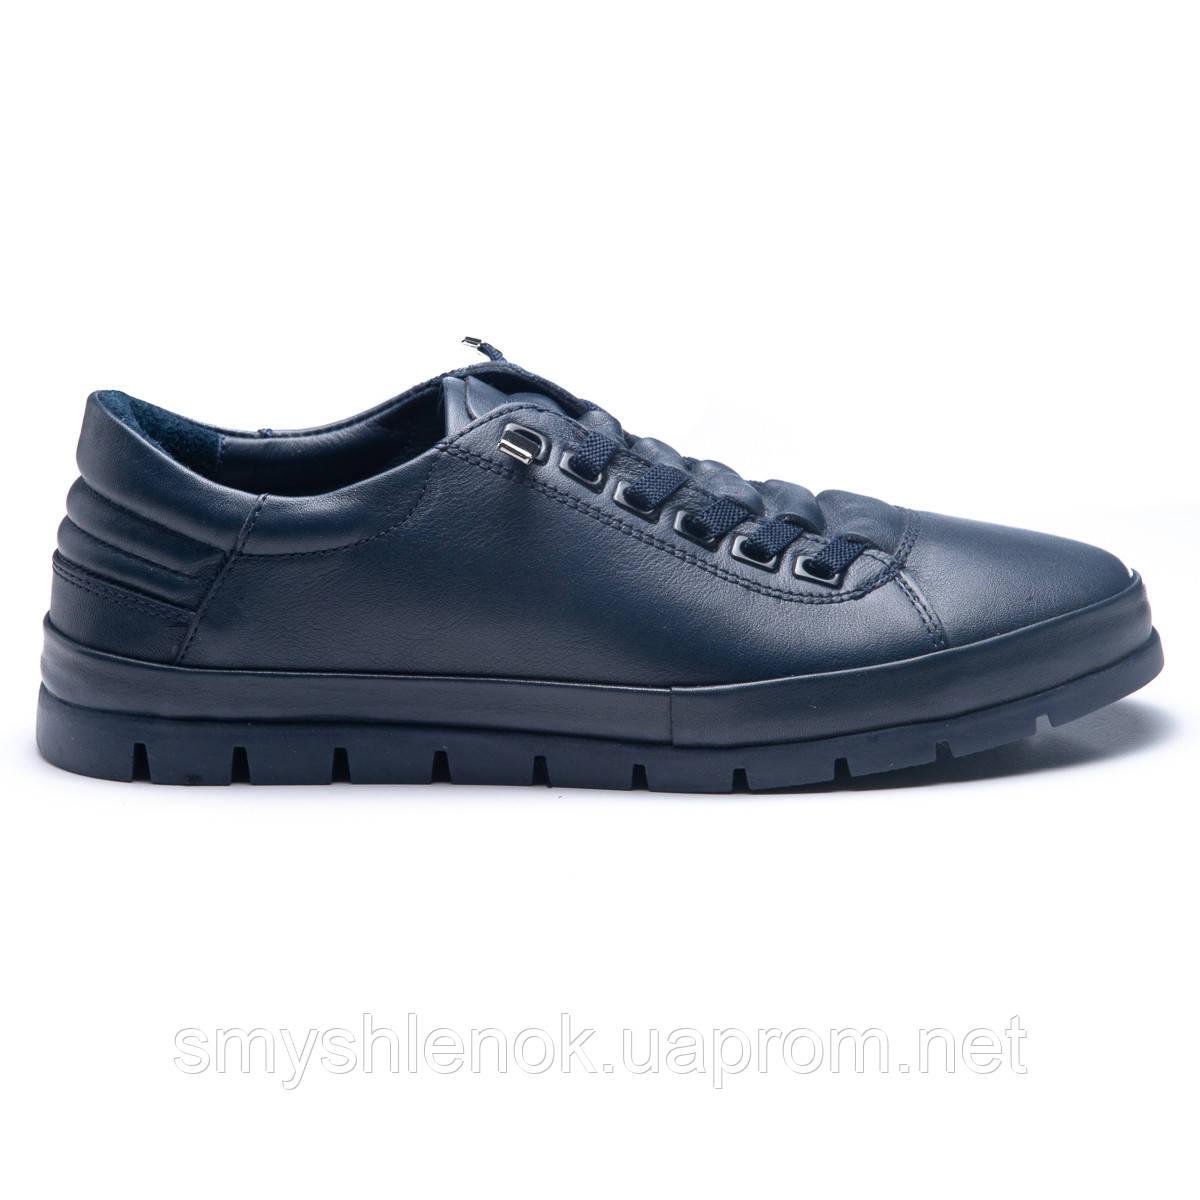 Туфли,мокасины Theo Leo RN984 39 25 см Синие